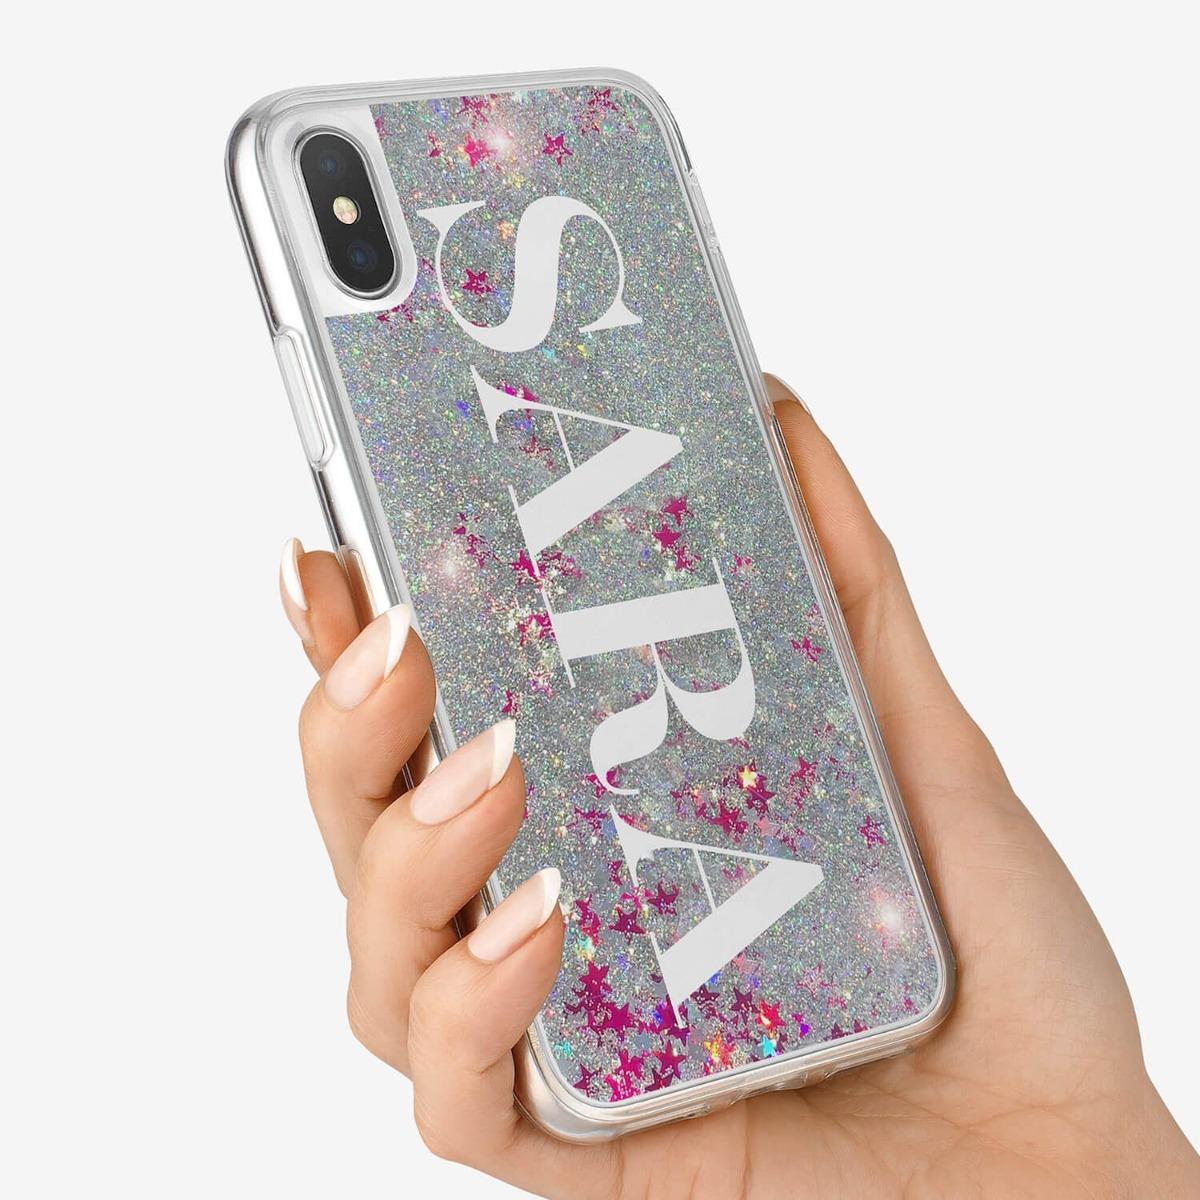 Galaxy S8 Plus Glitter Case 16238